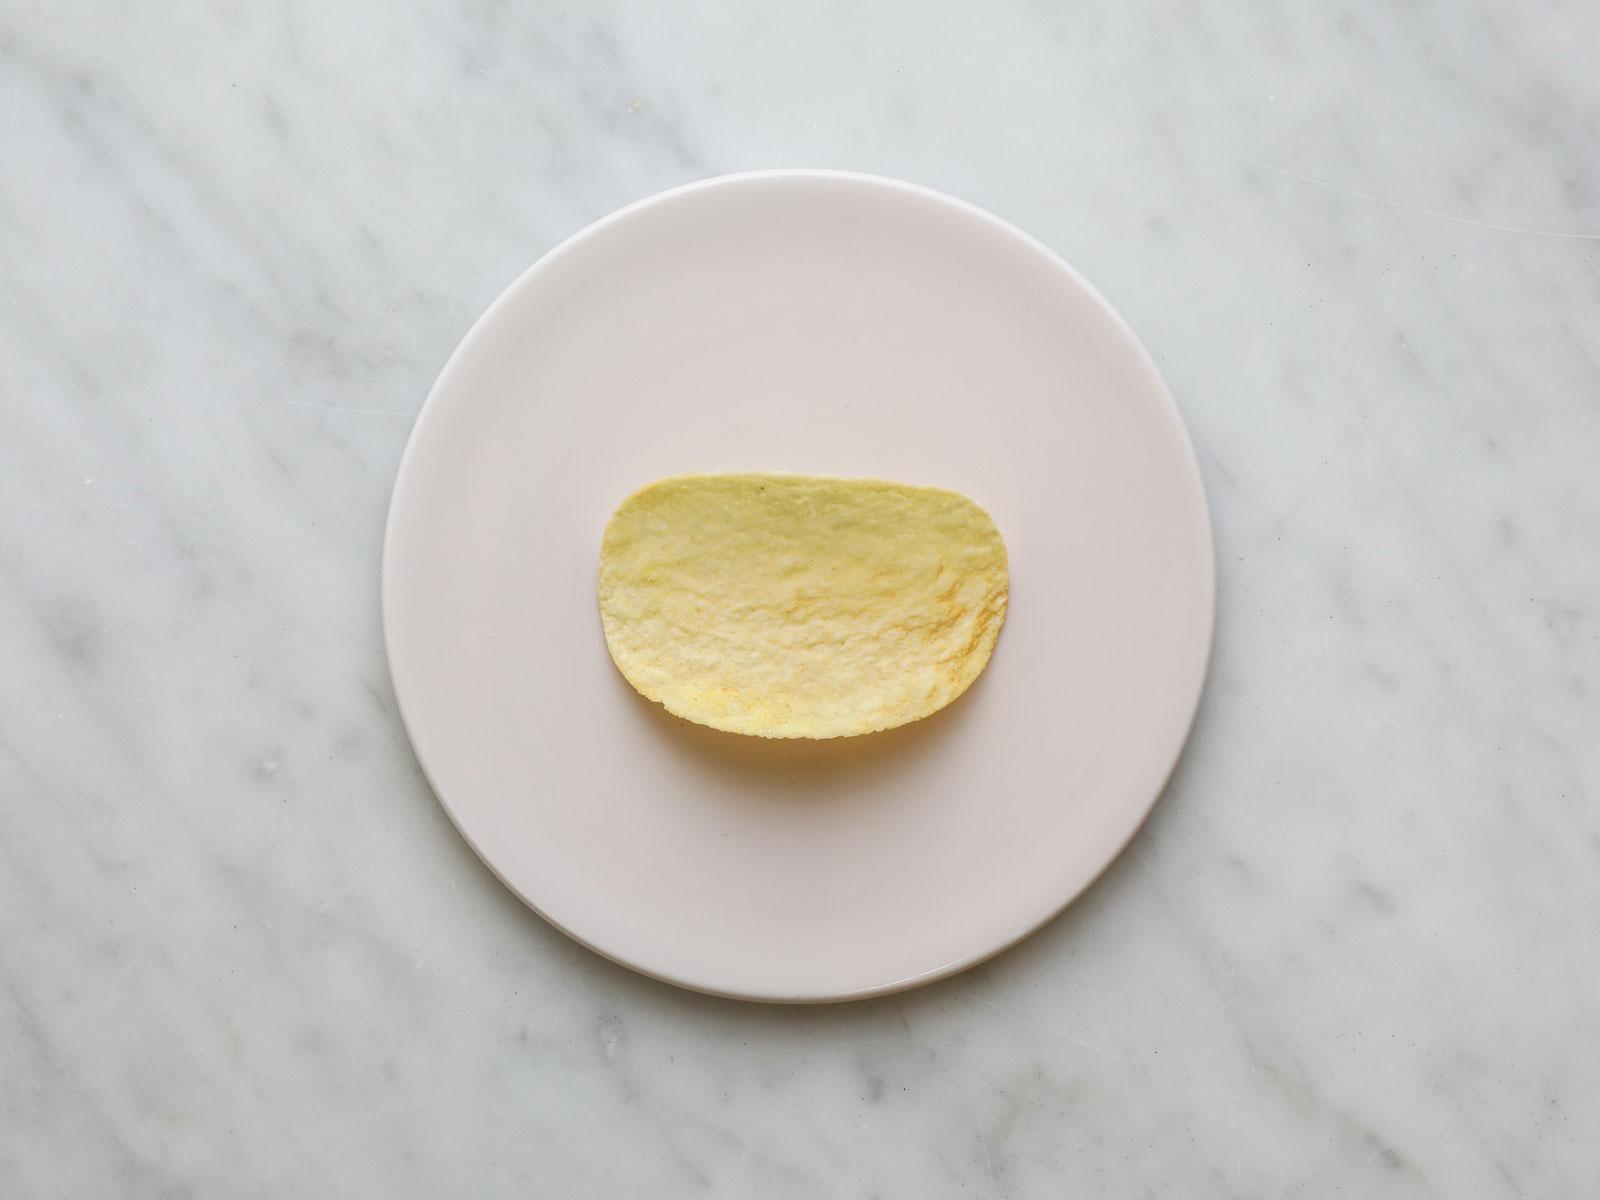 Cheddar and Sour Cream Pringles